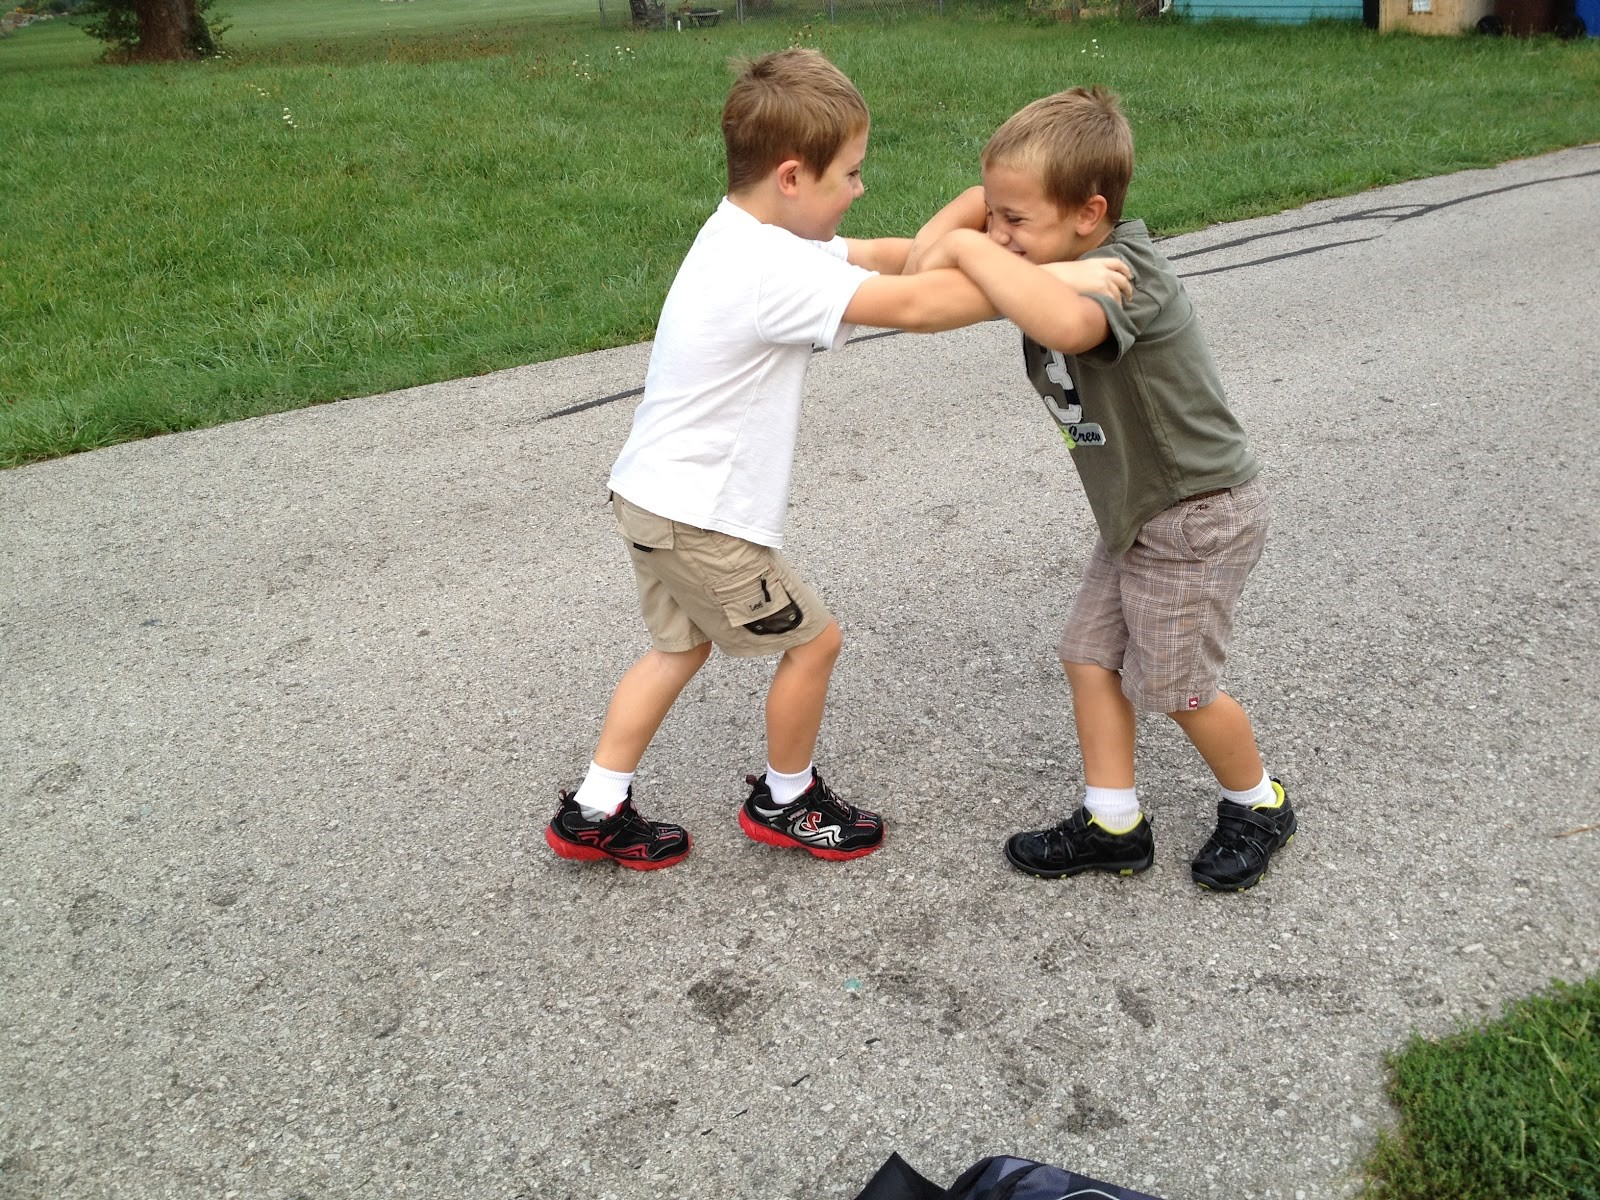 Penyebab Anak Jadi Suka Memukul Temannya